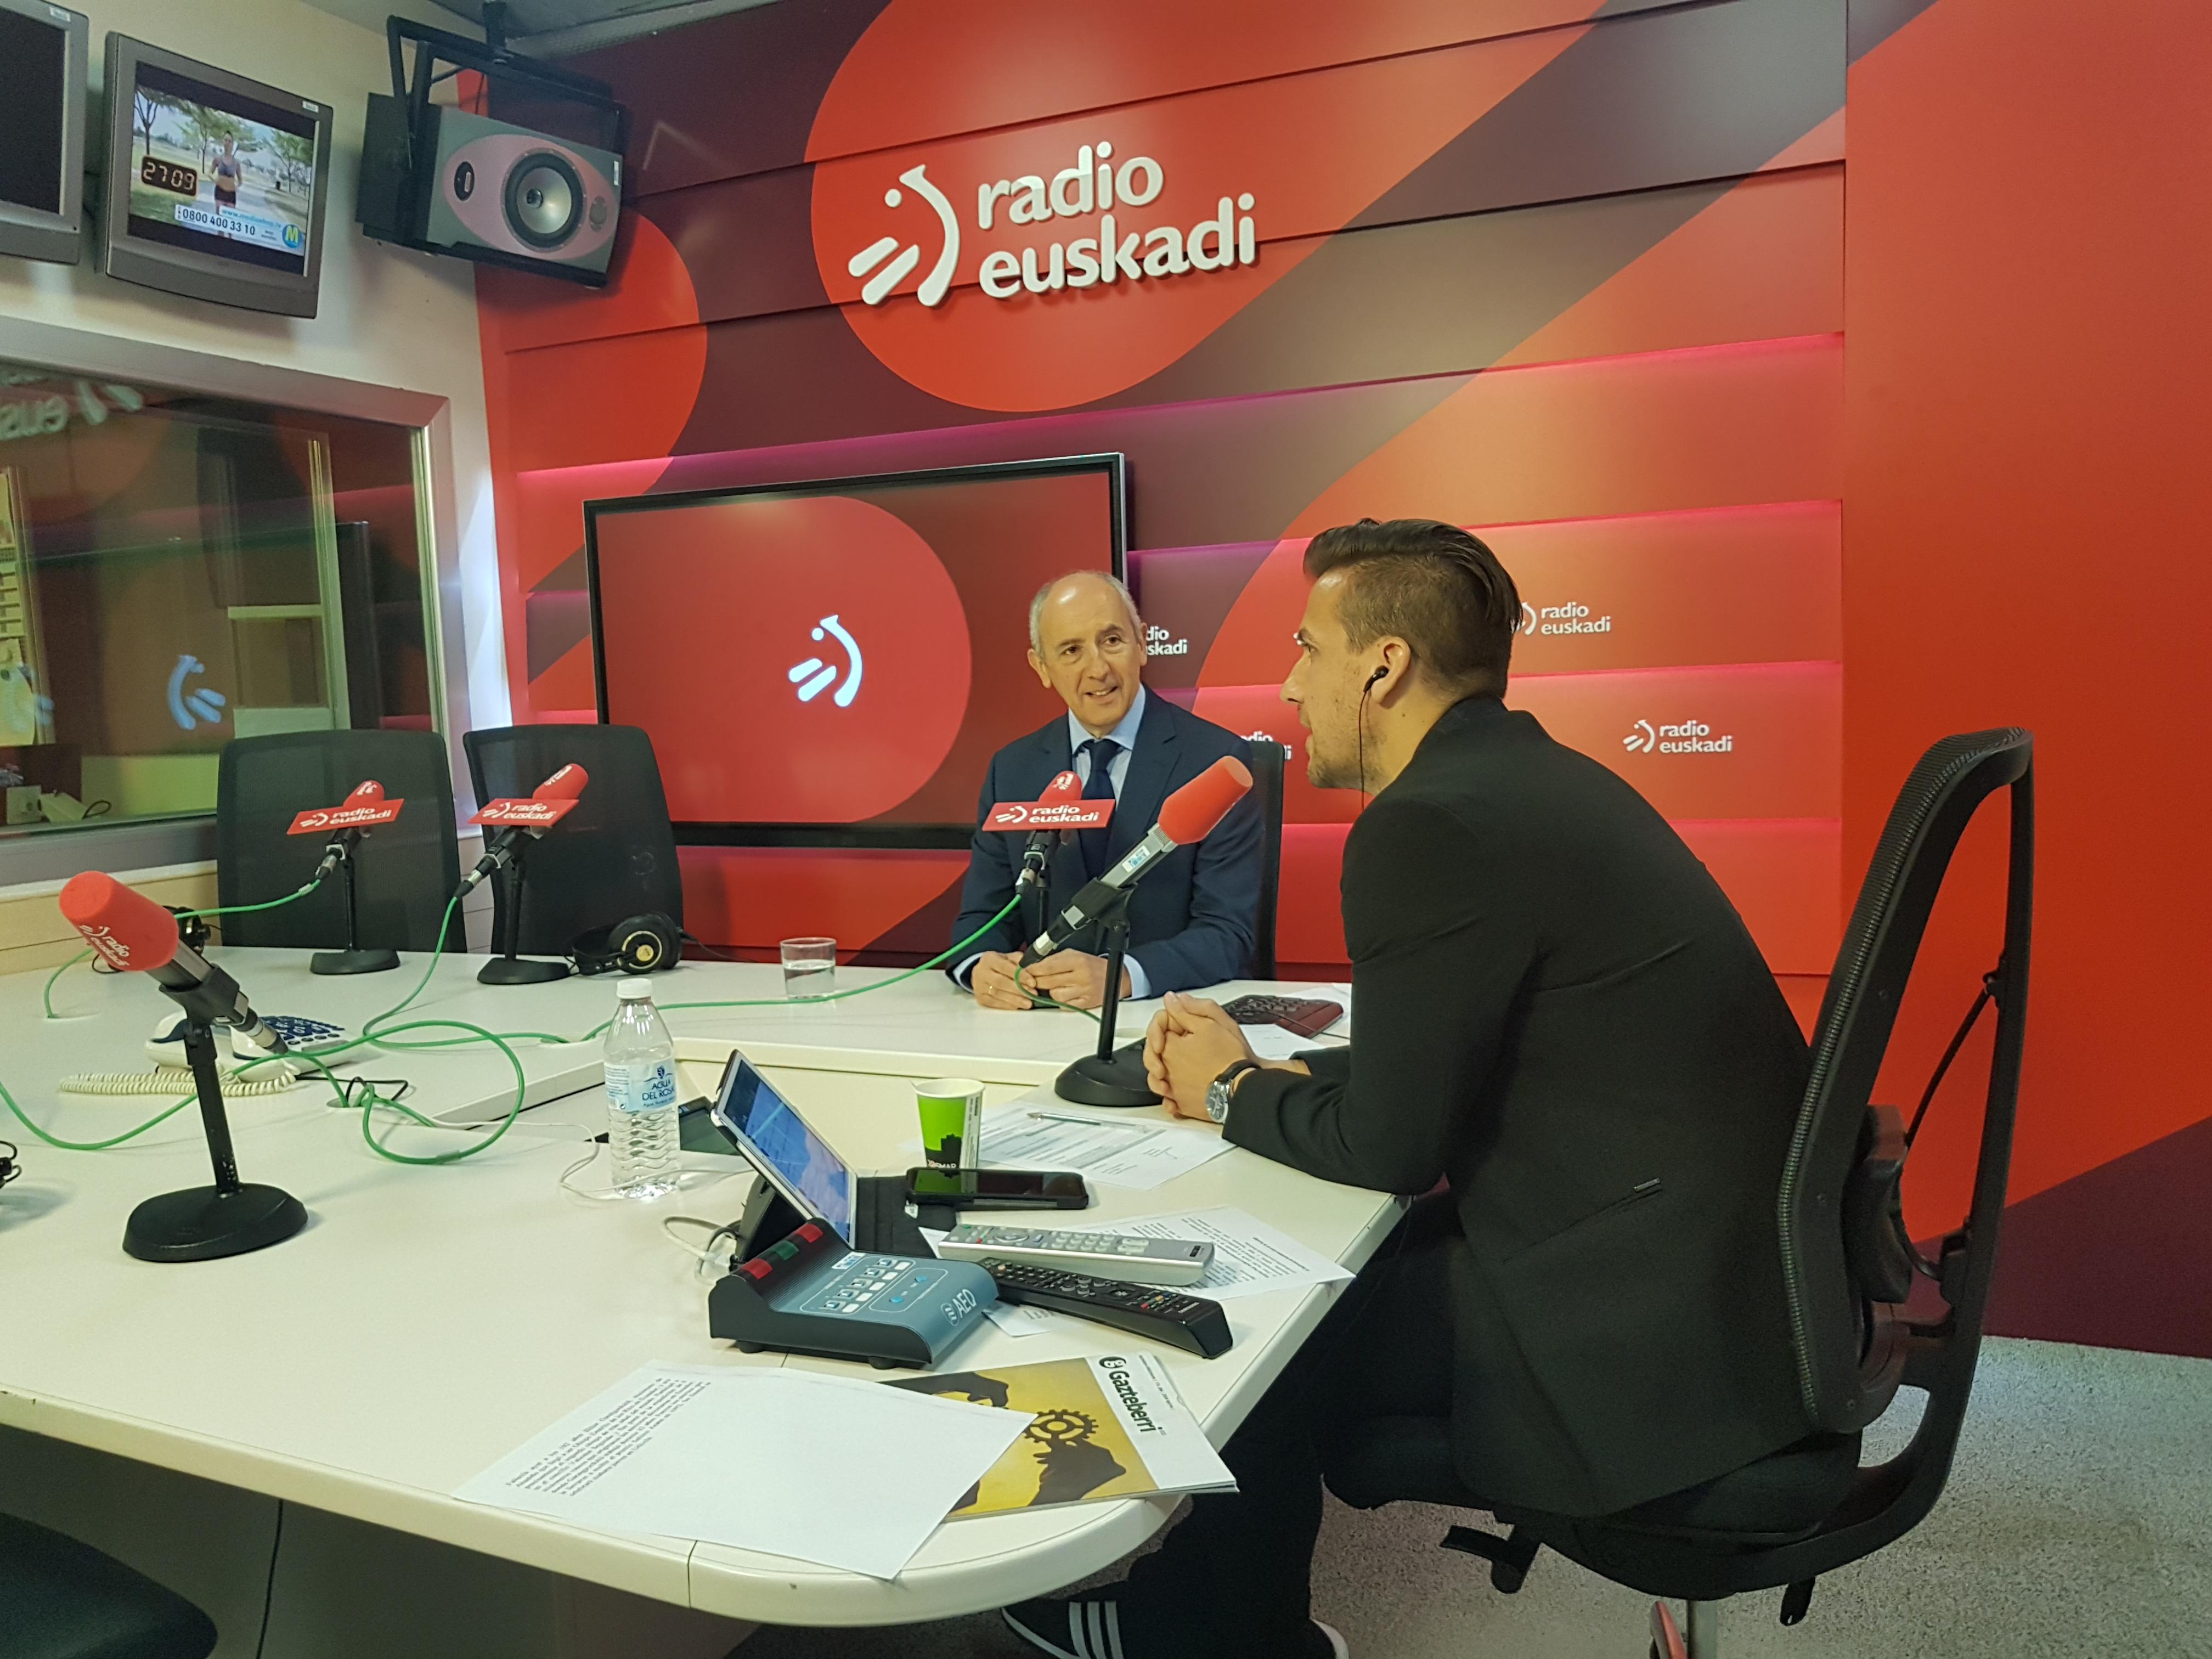 Entrevista a Josu Erkoreka en Radio Euskadi